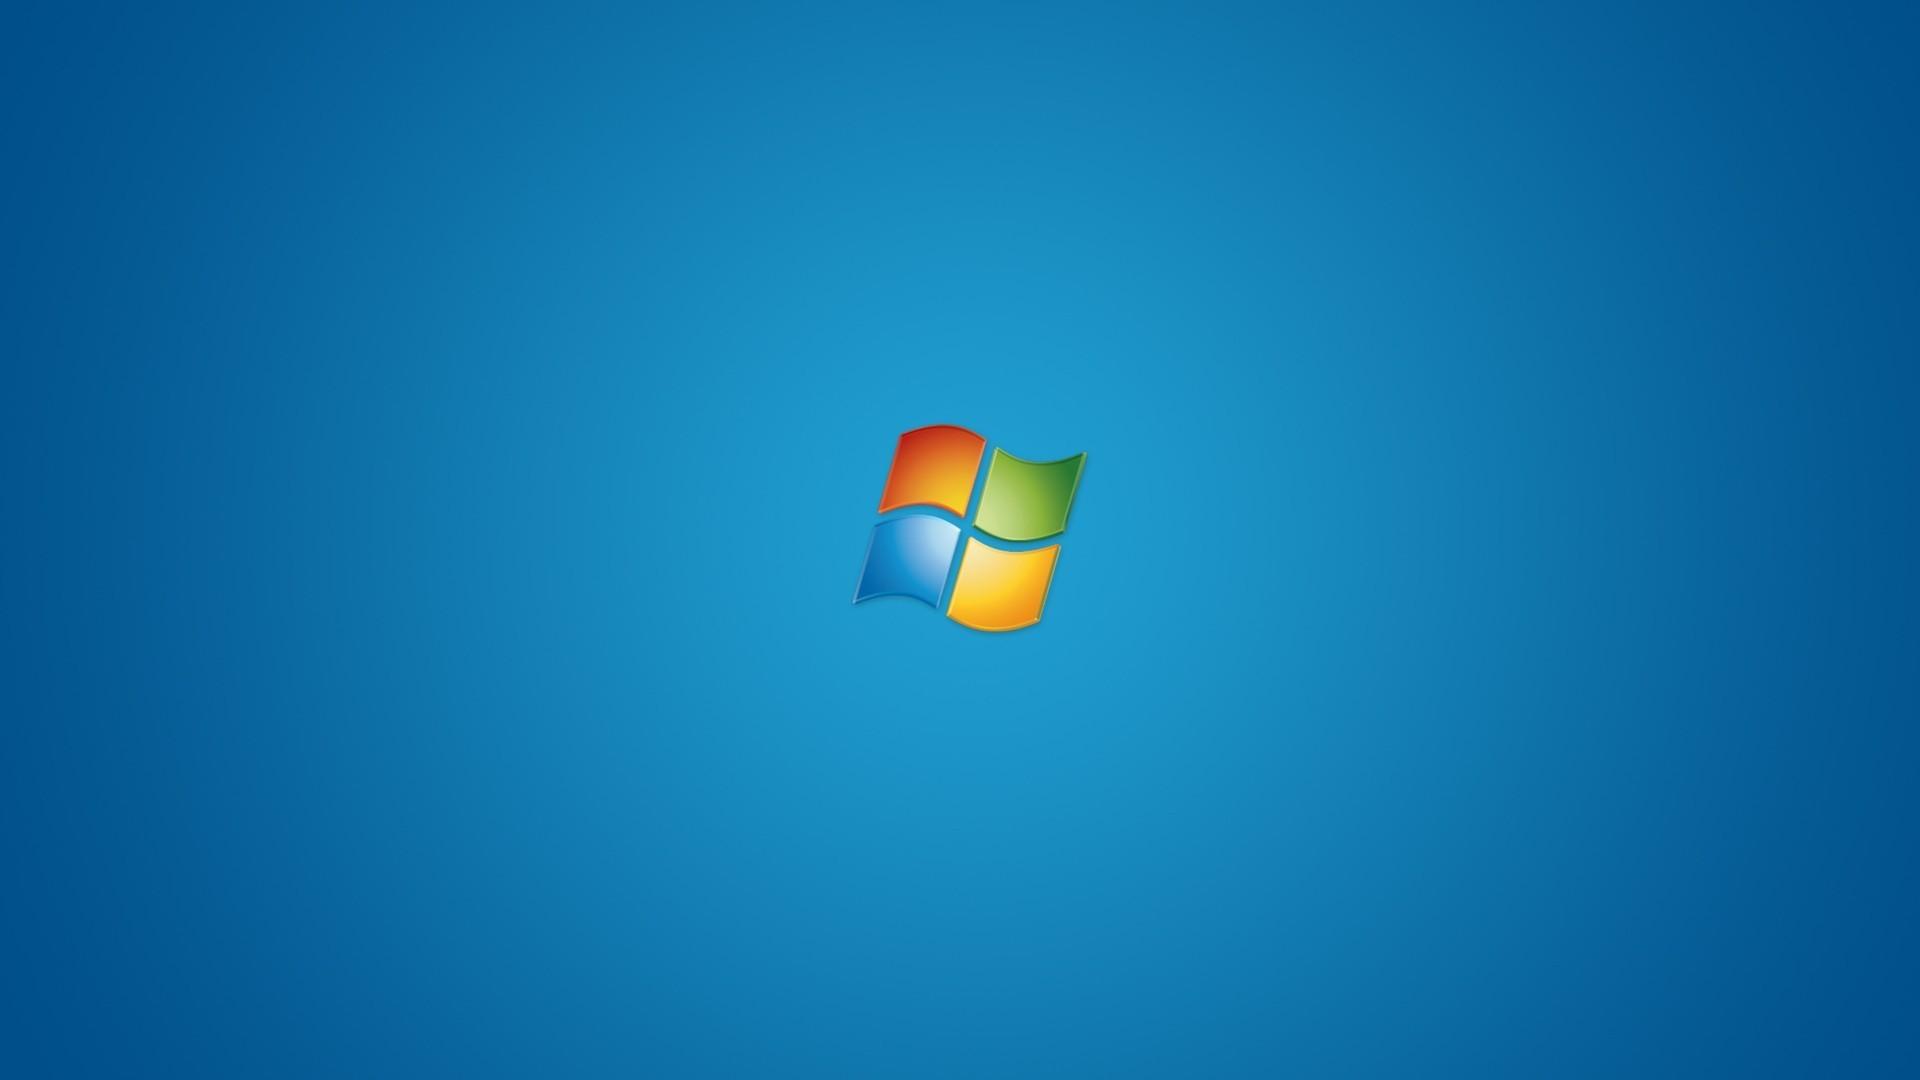 Windows XP error Microsoft Windows Blue Screen of Death wallpaper